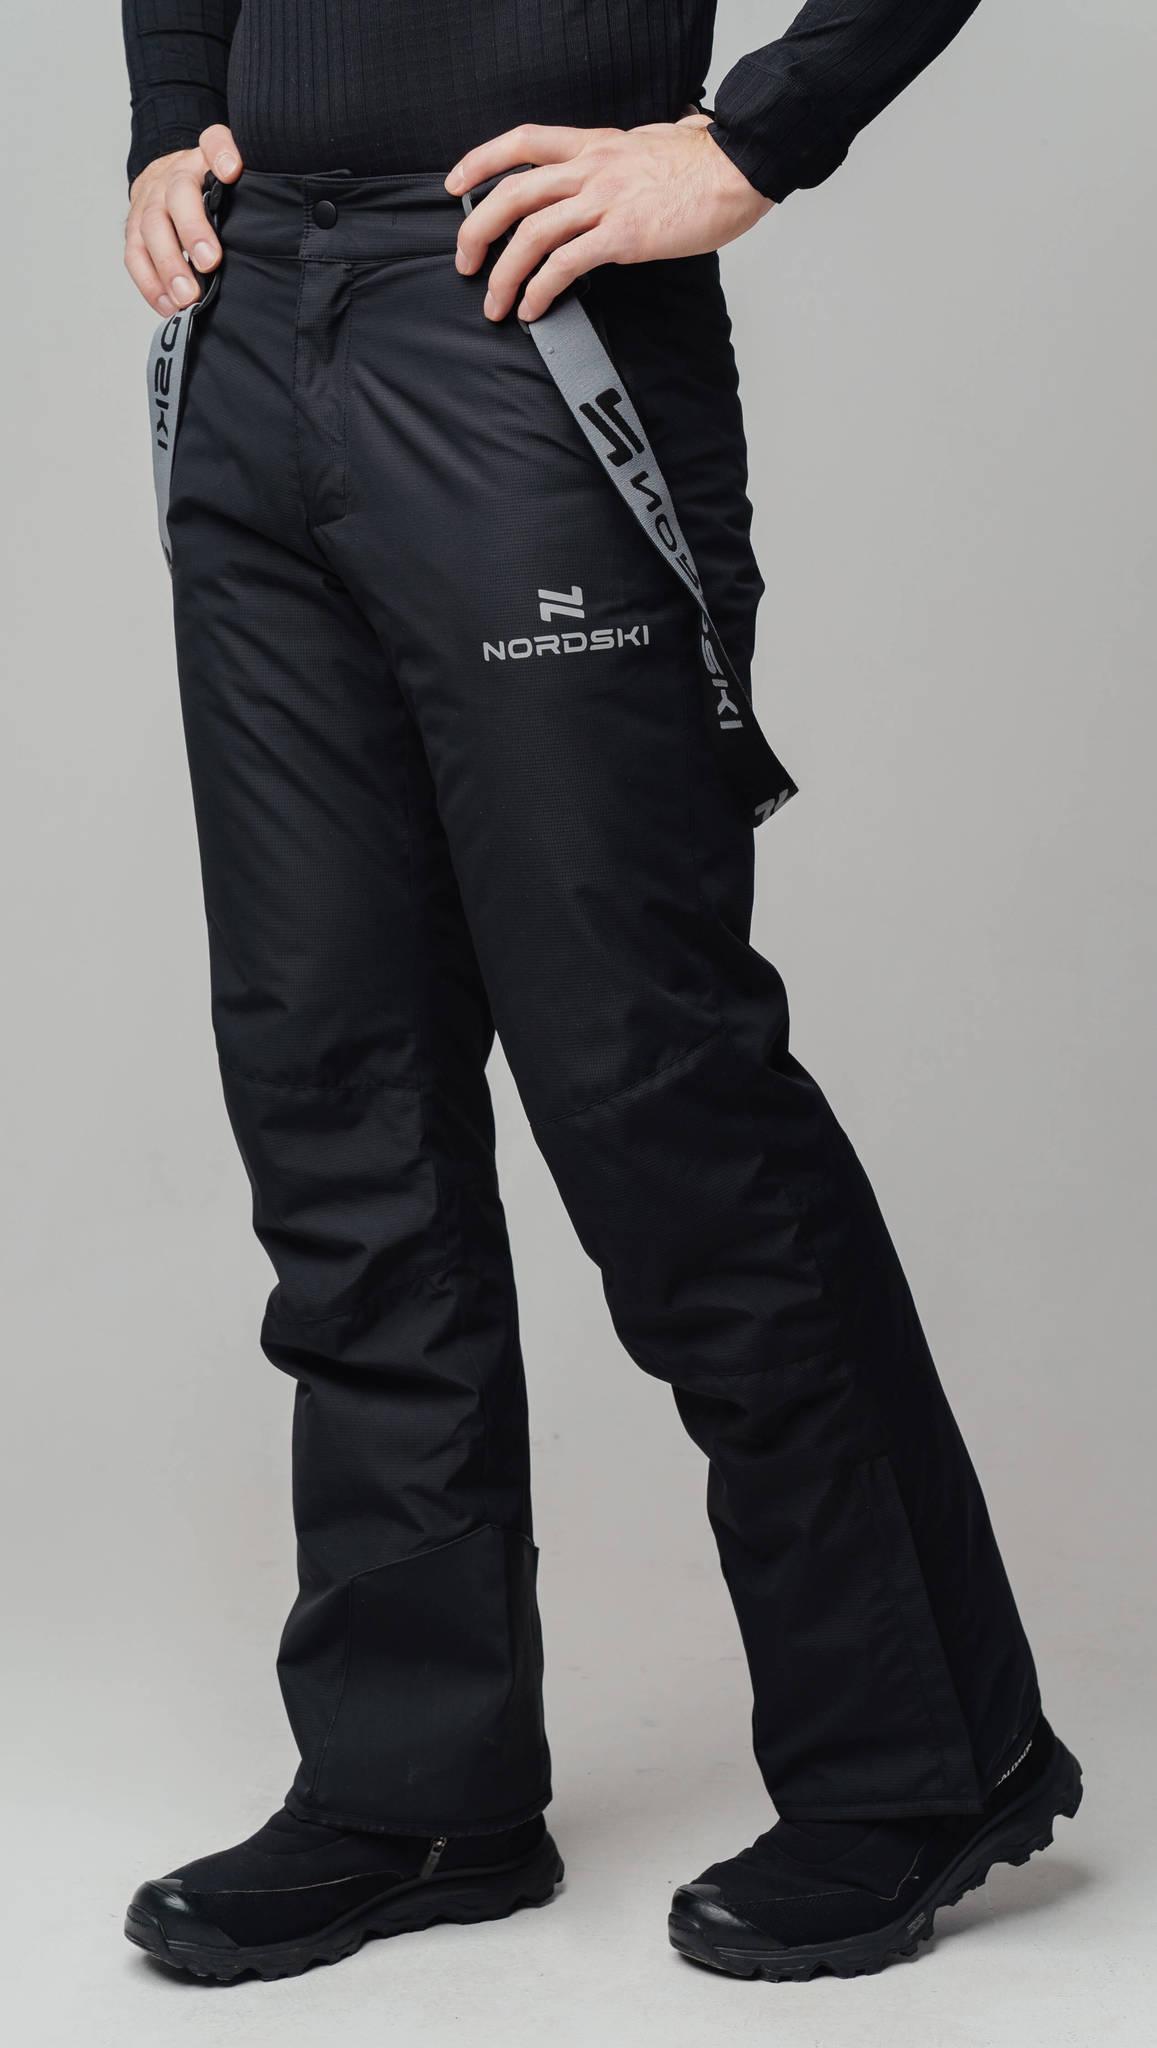 Nordski Extreme горнолыжный костюм мужской lime - 15